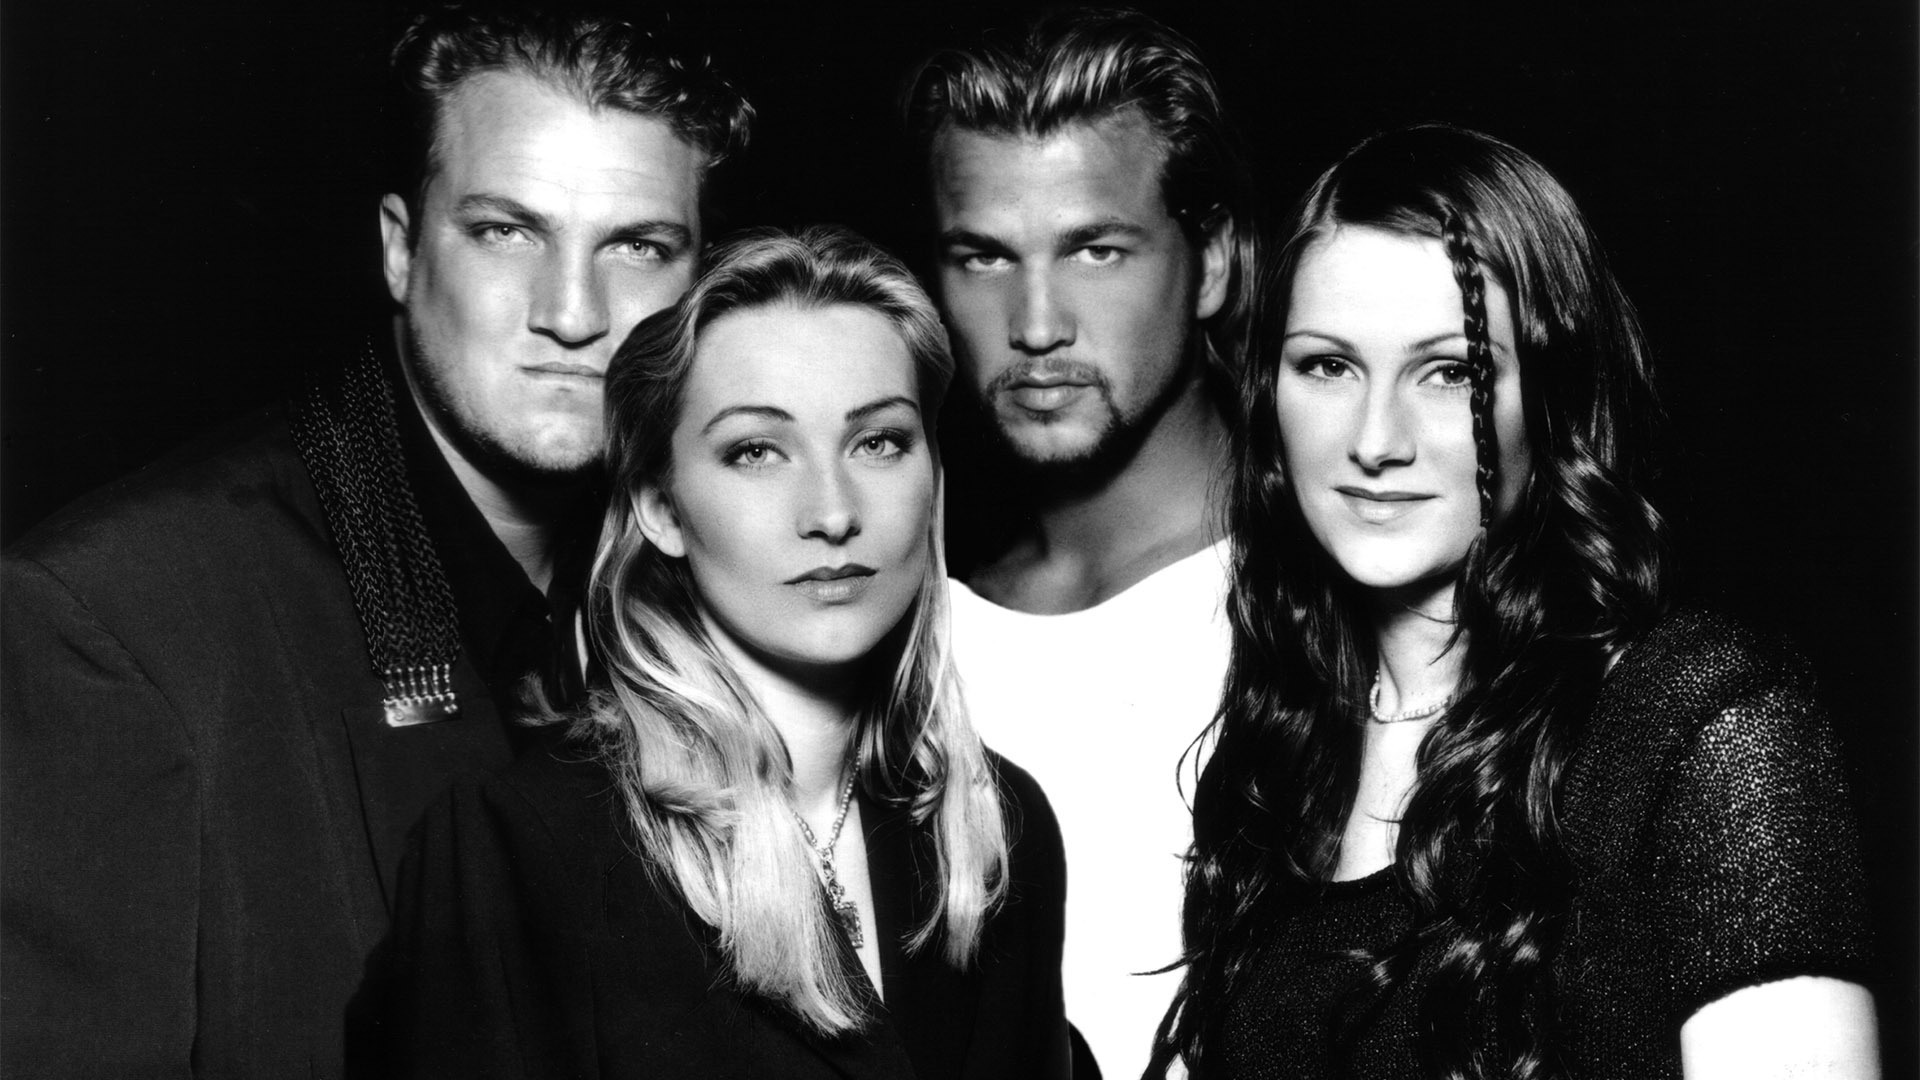 Love the 90's: Gala + Jenny from Ace of Base + Technotronic + Snap! + Vengaboys + OBK + Viceversa + Whigfield + Rebeca + Chimo Bayo...